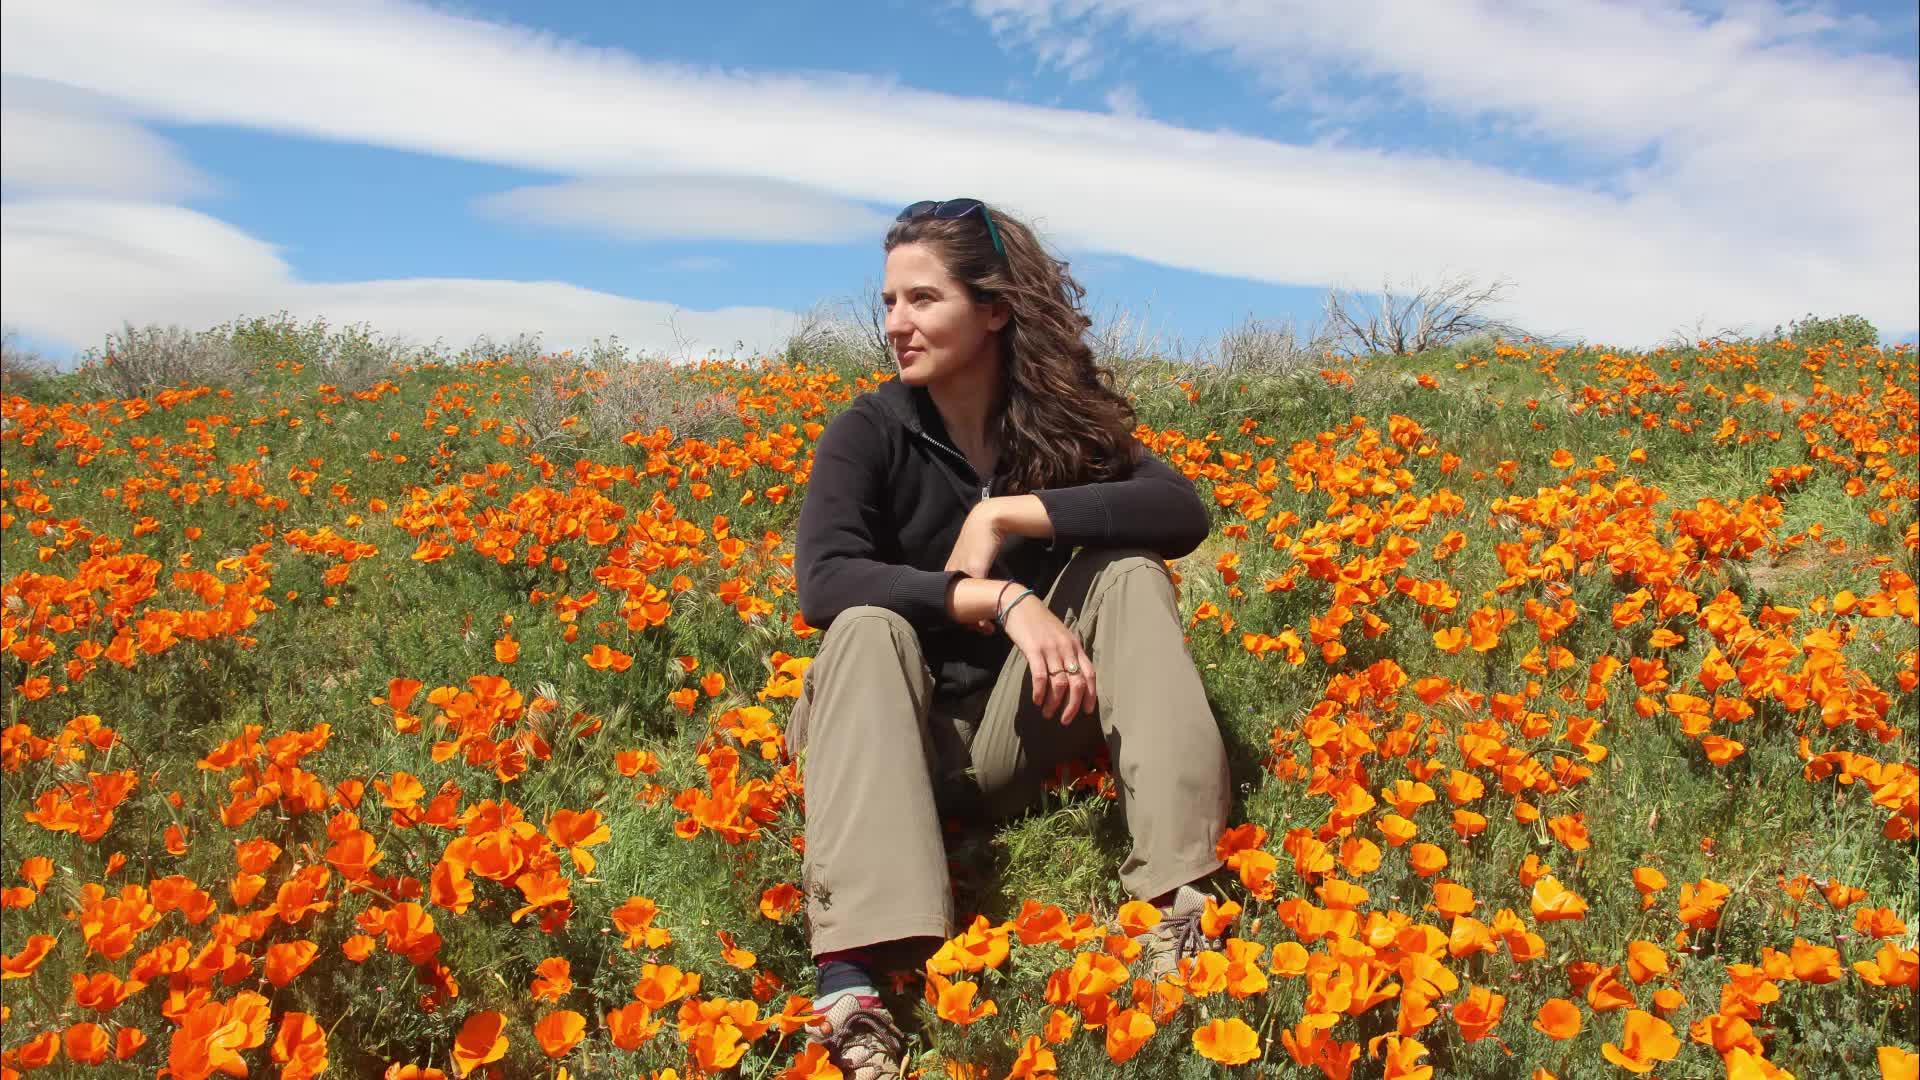 Interview with wildlife biologist Lara Drizd